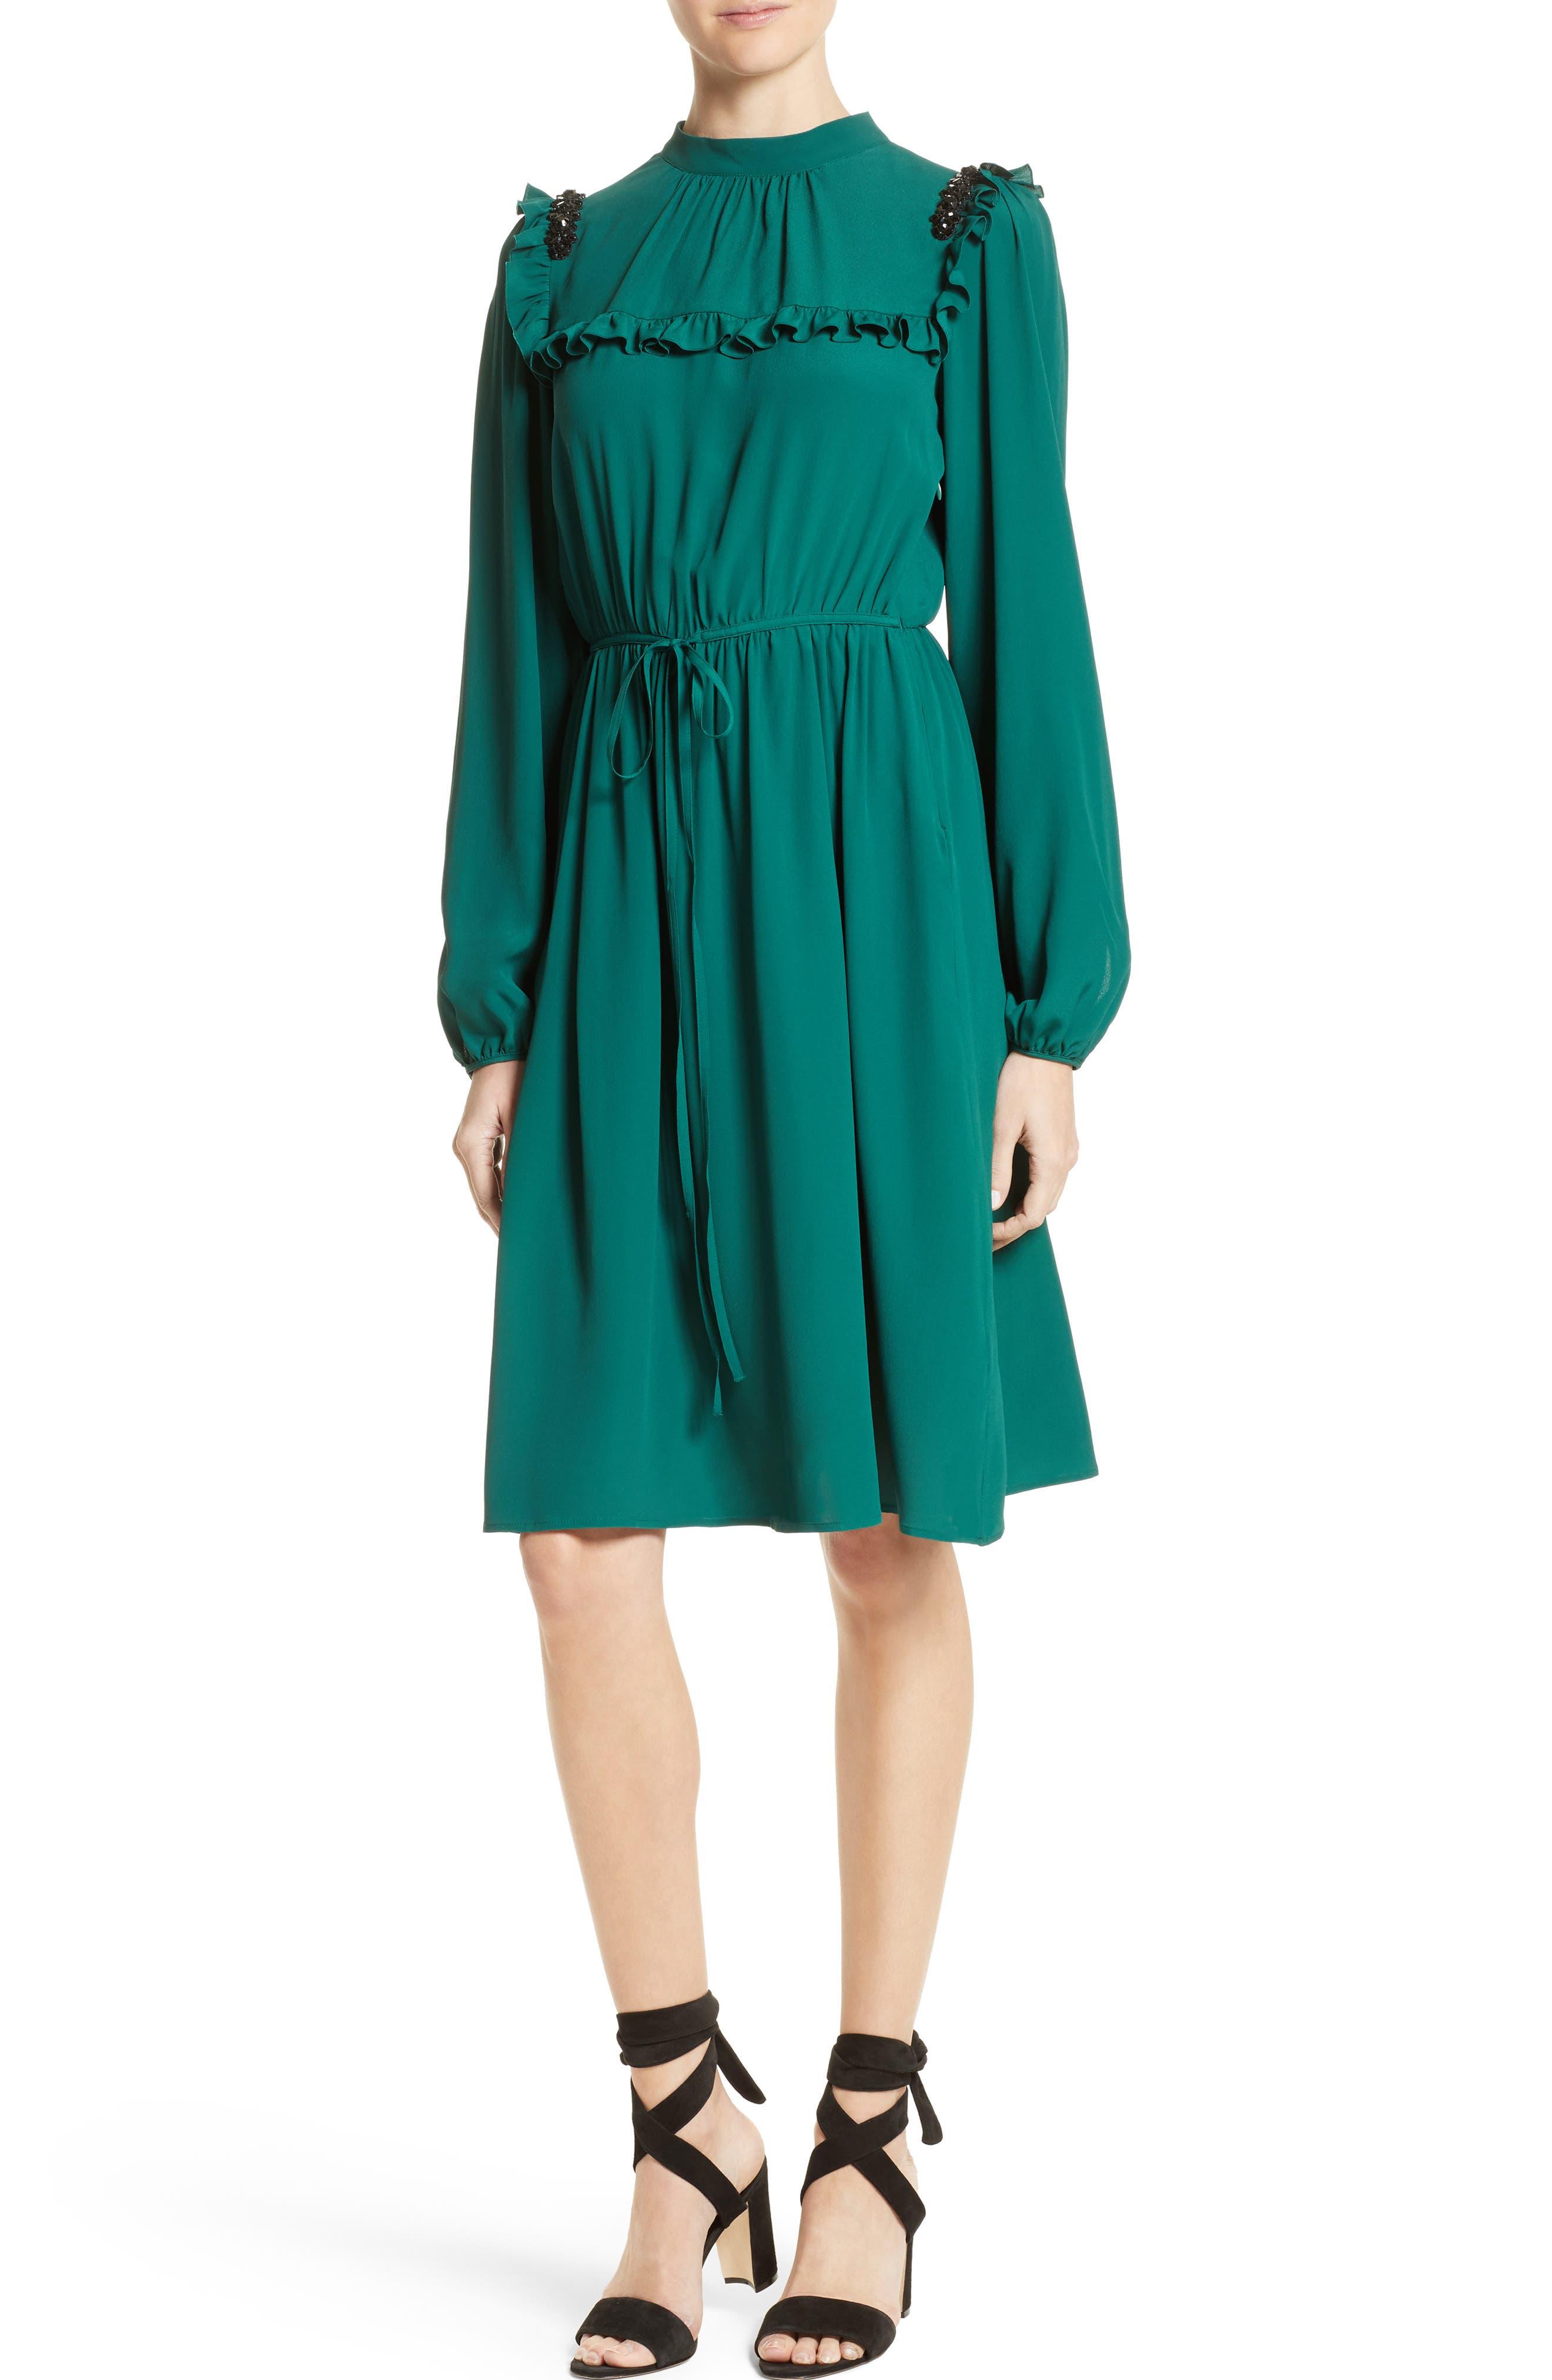 Crystal Embellished Ruffle Dress,                         Main,                         color, 300